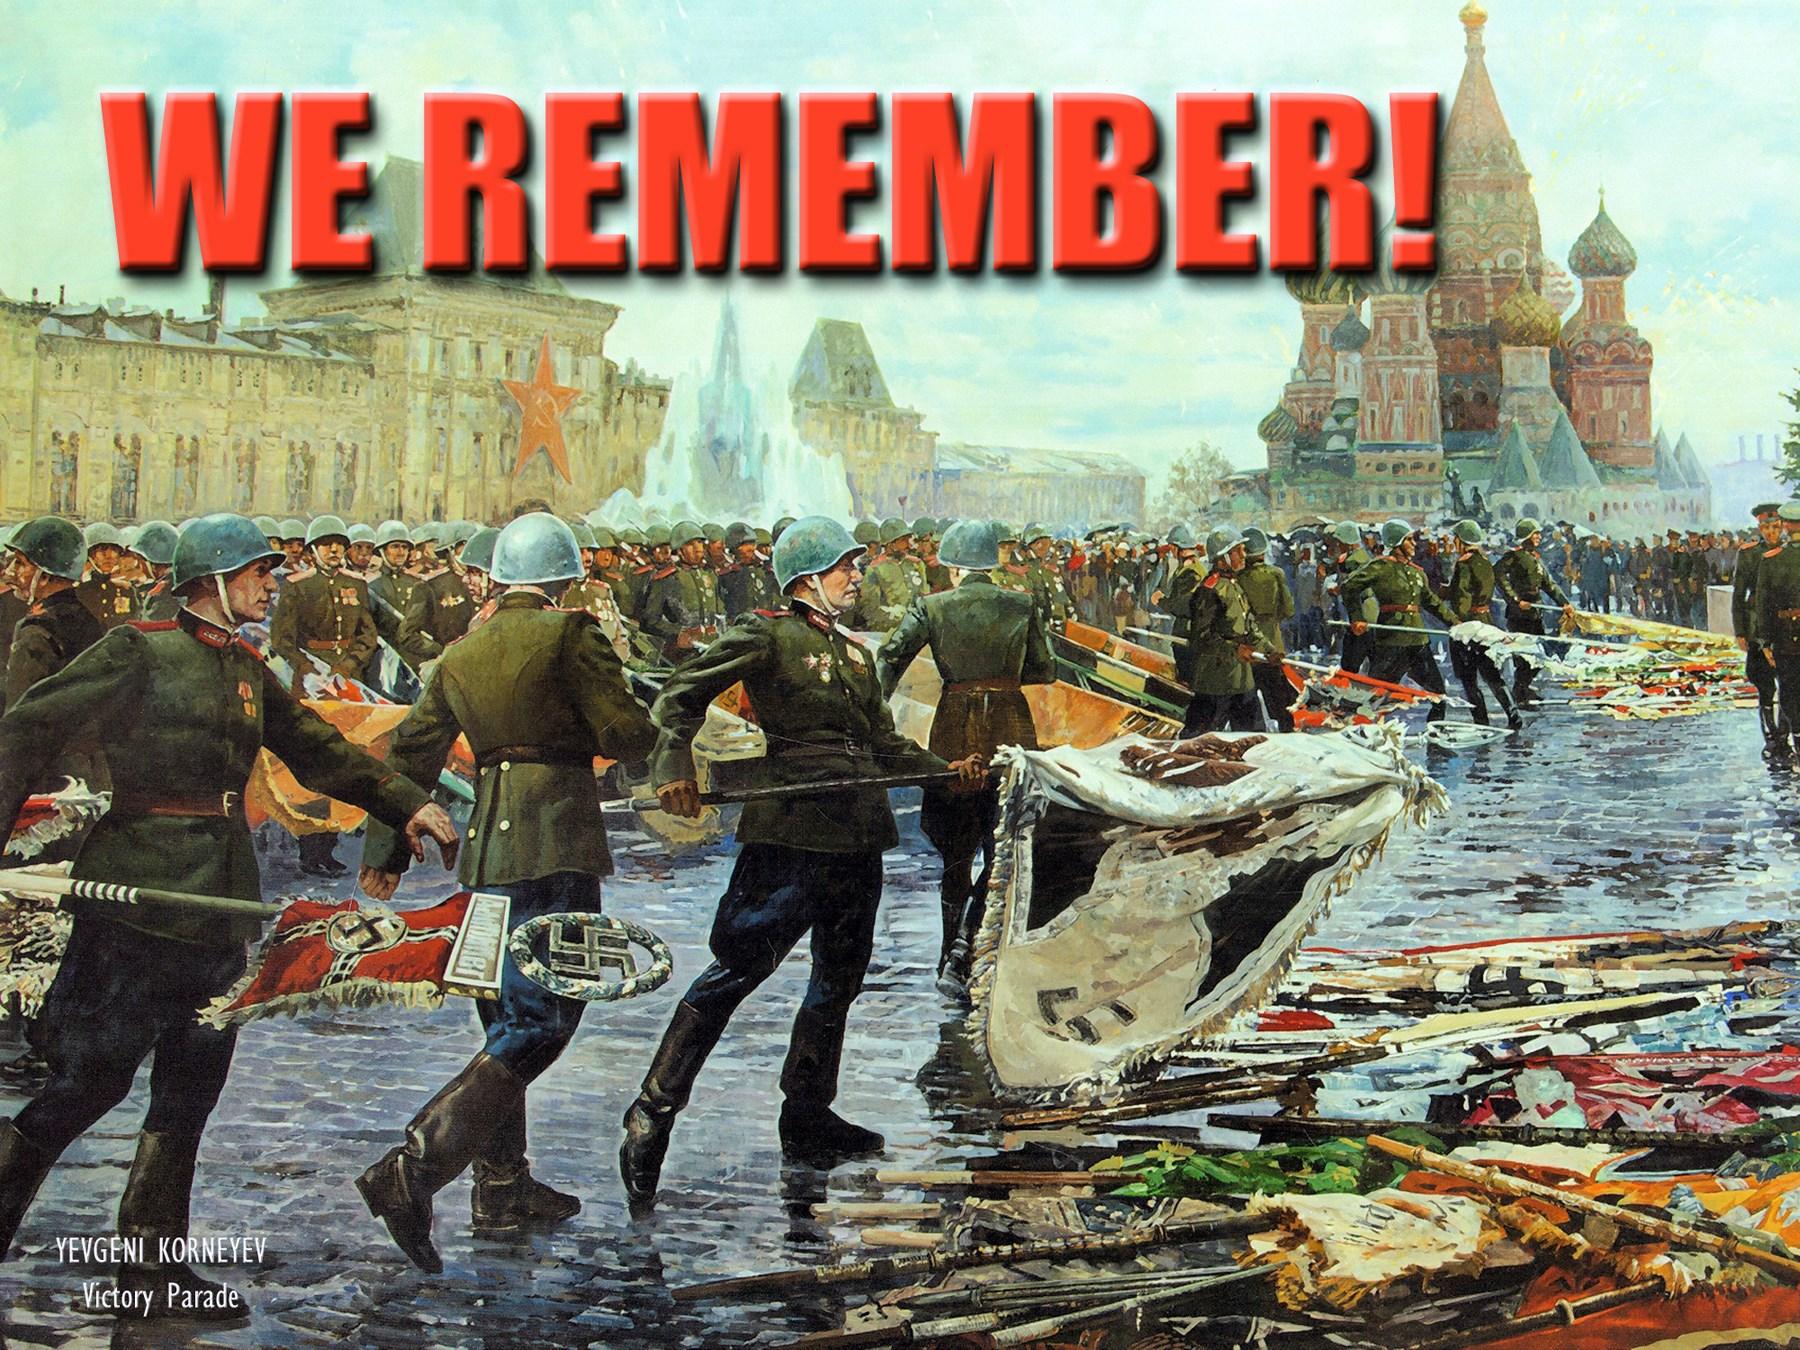 00 E A Korneyev. we remember! Victory Parade